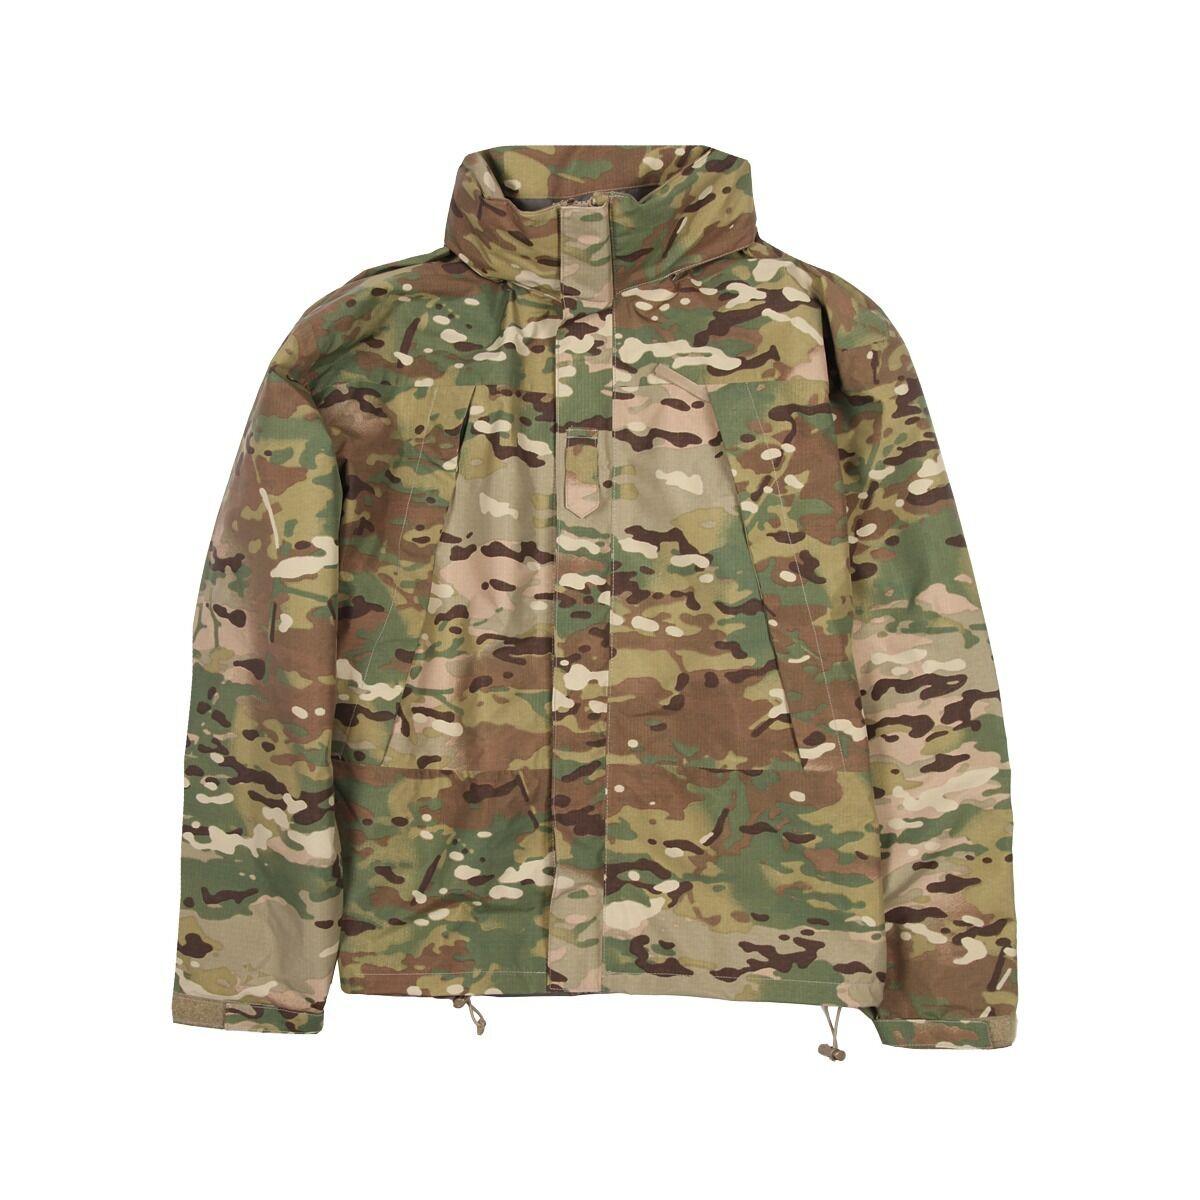 Us Army Ecwcs ocp multicam level 6 Goretex Jacket chaqueta XSS xsmall Short